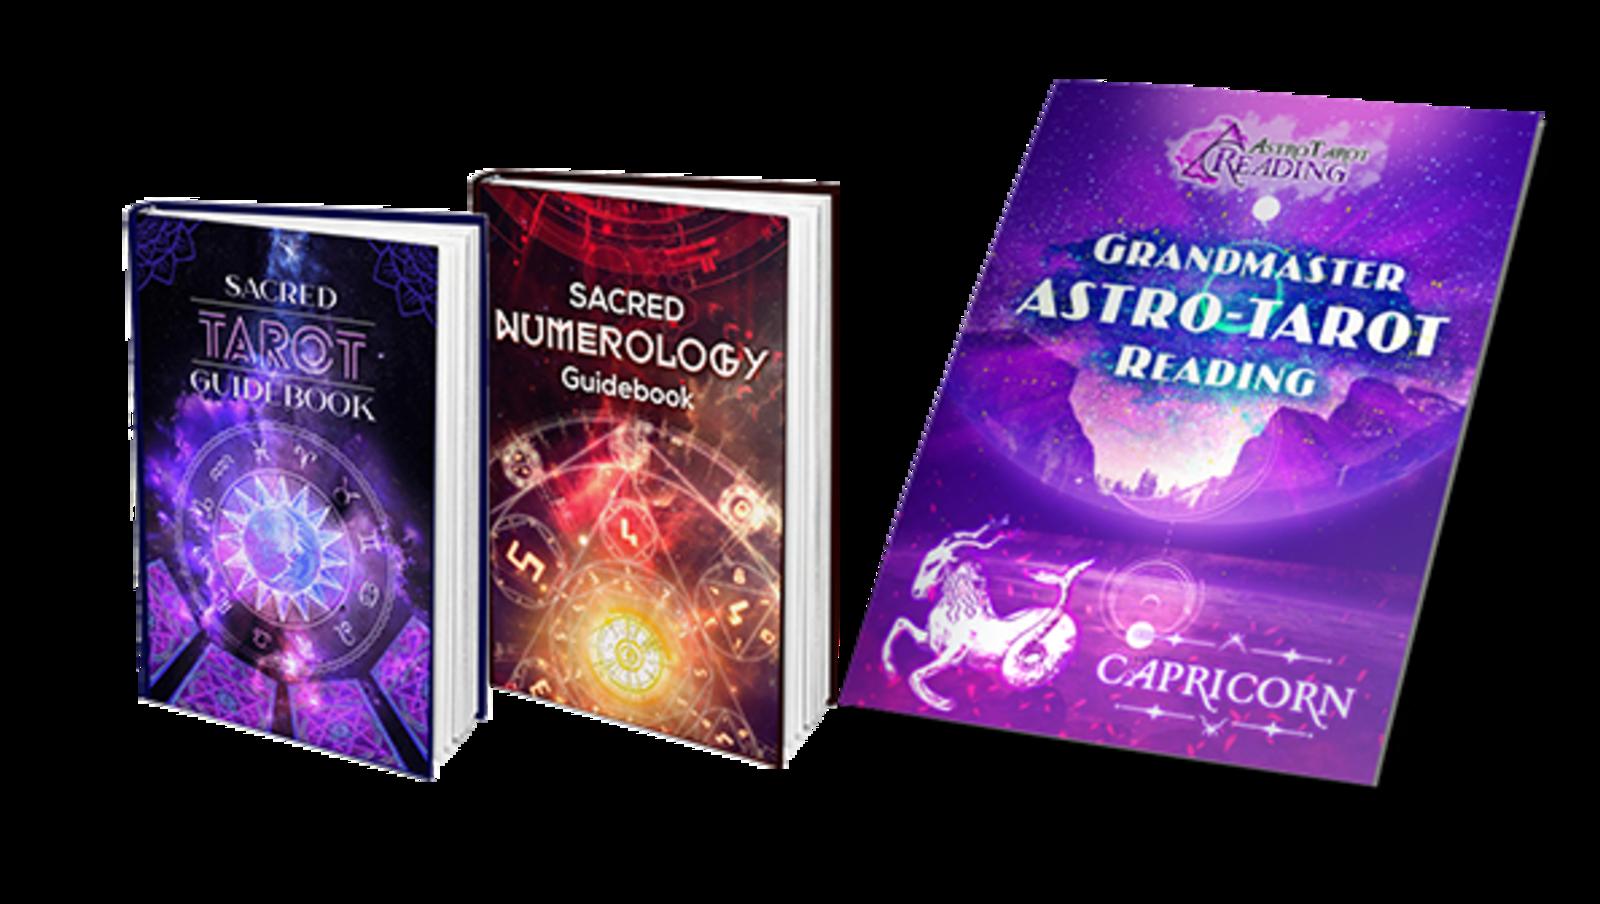 Astro Tarot Reading Reviews: Grandmaster AstroTarot Reading by MJ Customer Reviews